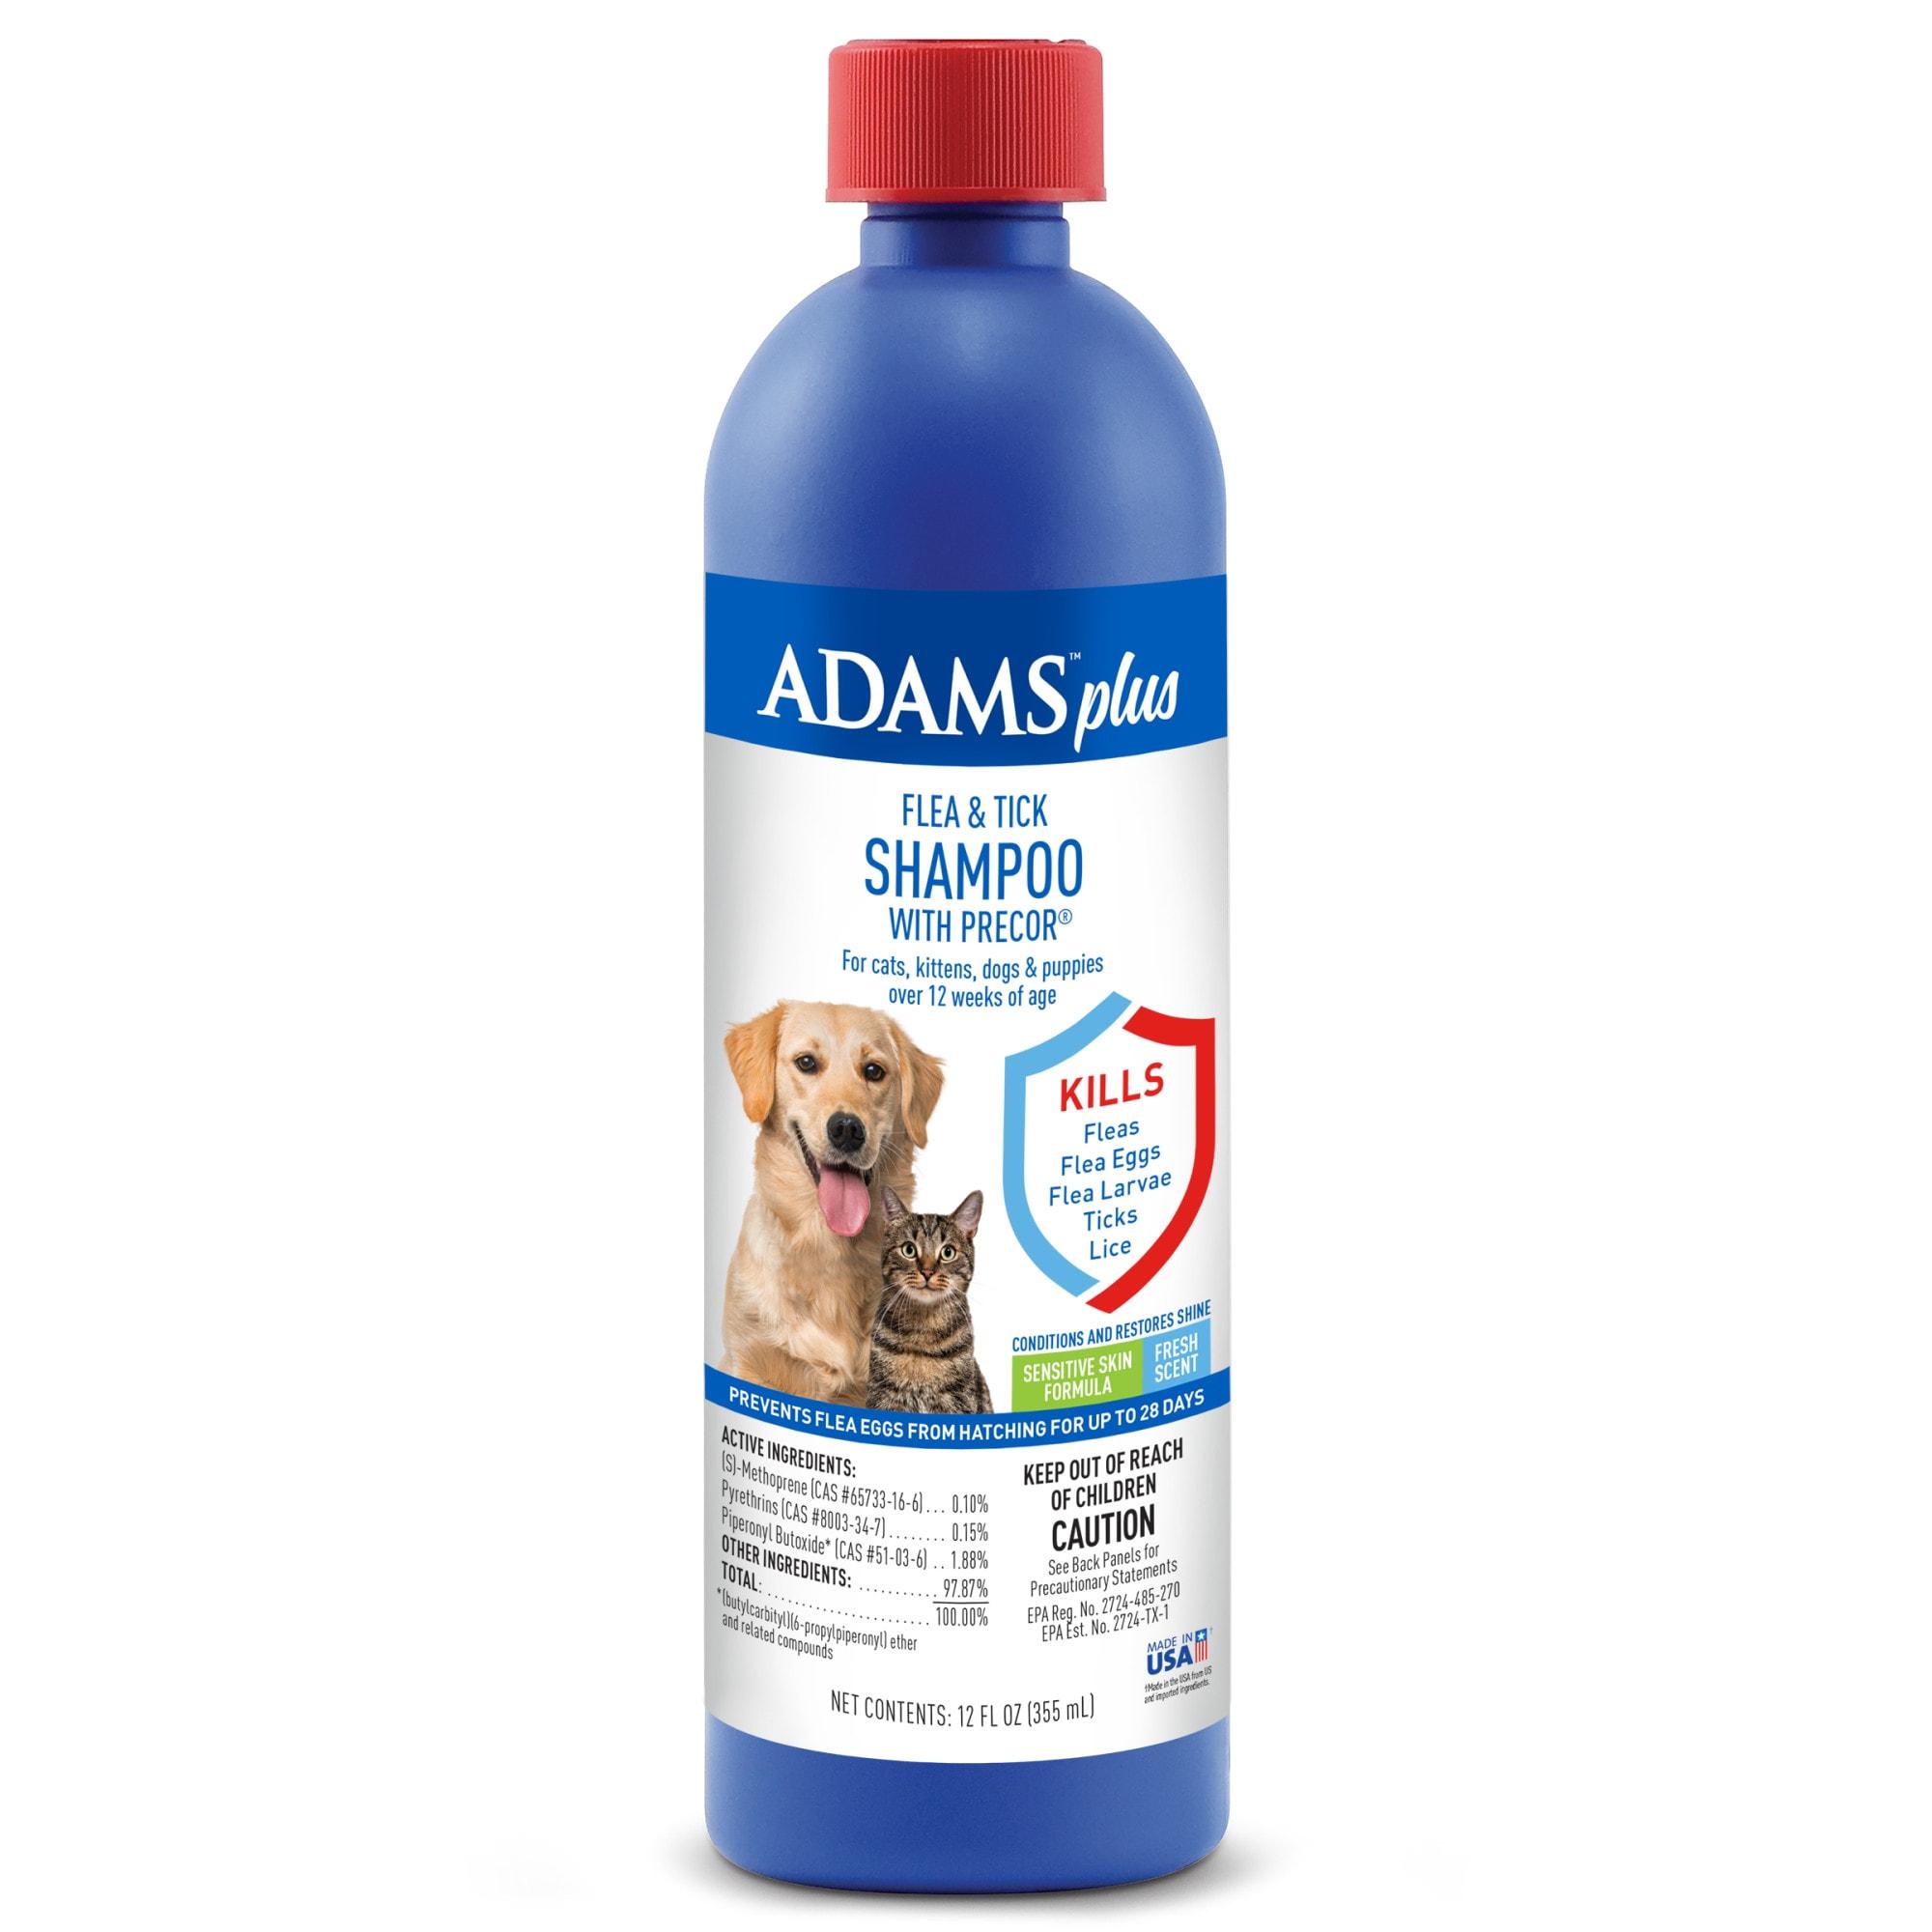 Adams Plus Flea & Tick Shampoo with